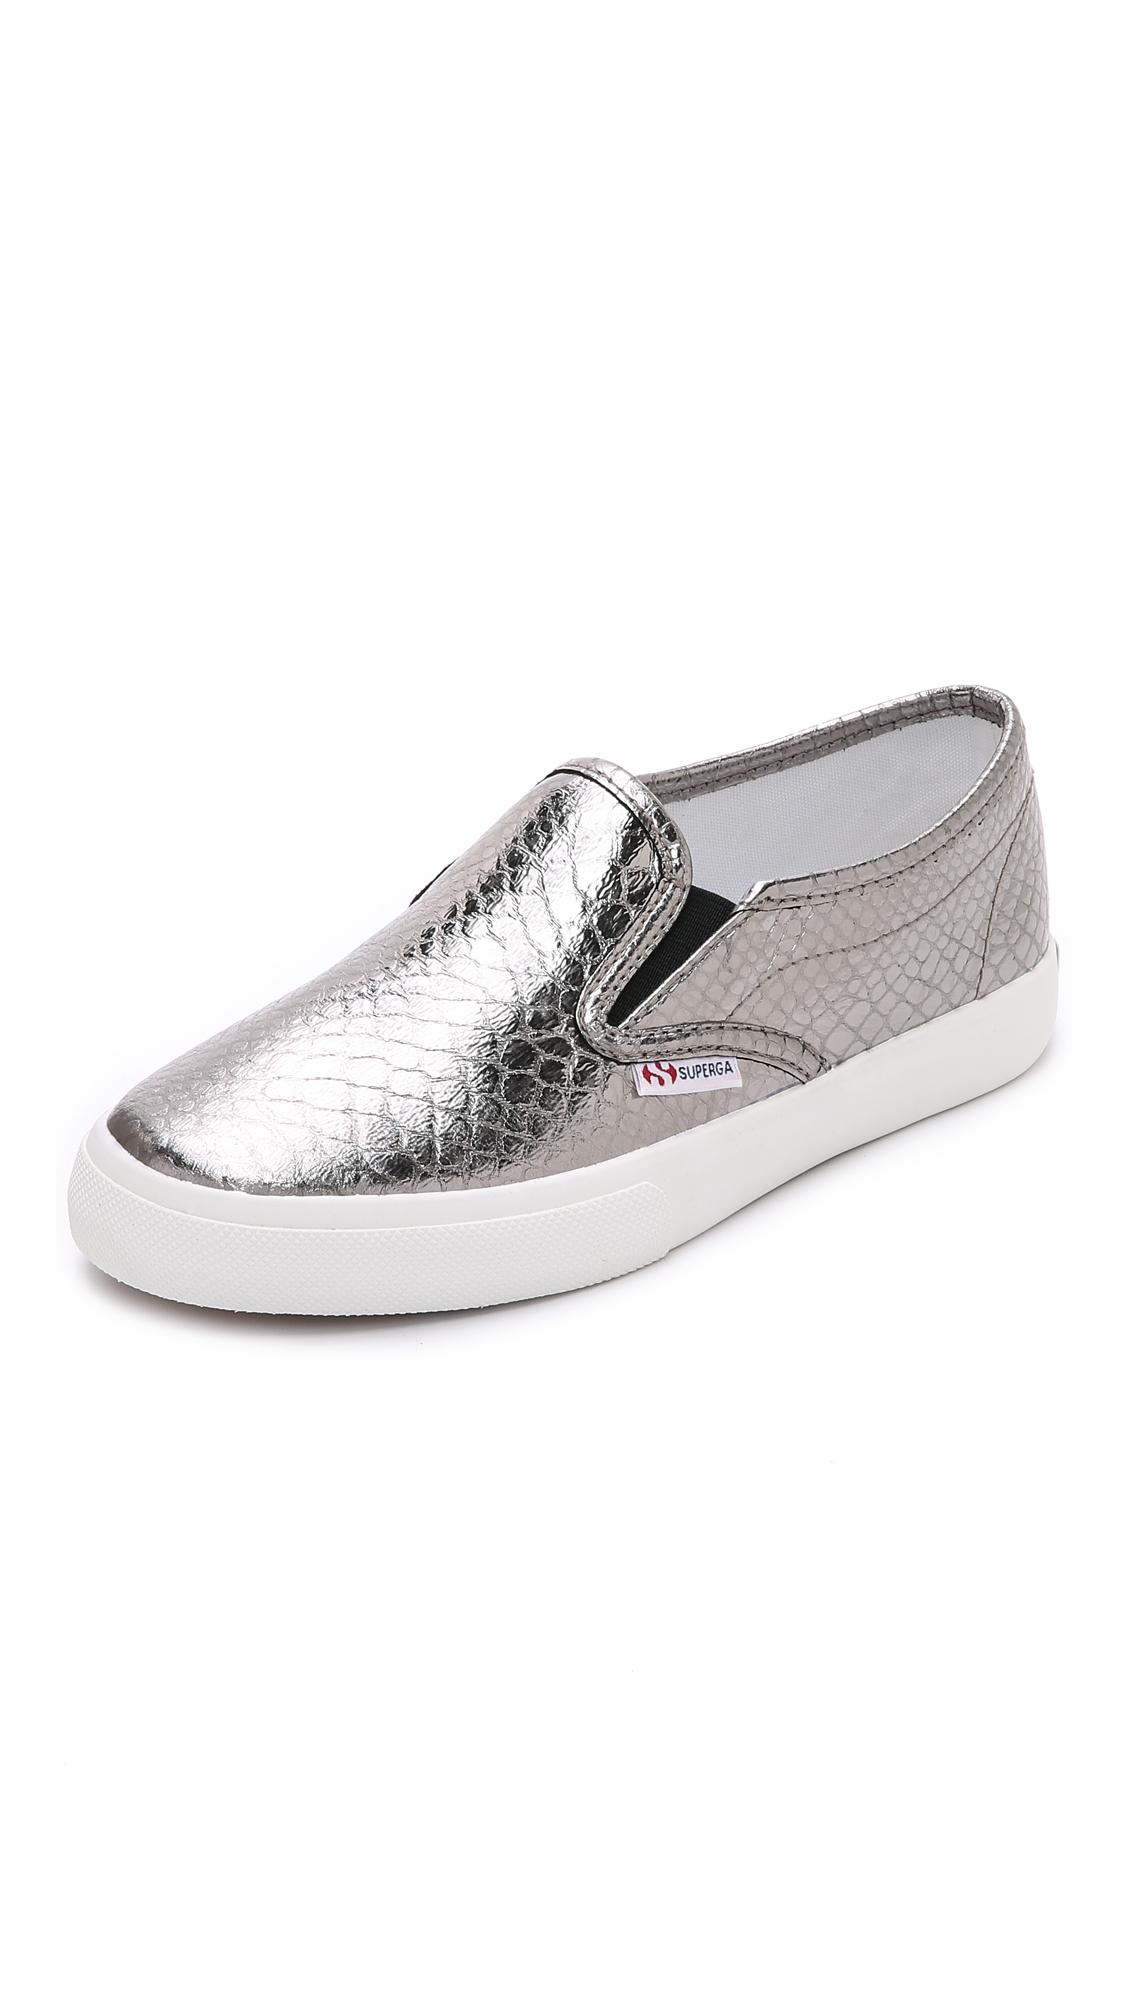 1f6620fb87 superga-graphite-2311-metallic-snake-slip-on-sneakers-graphite-gray-product-2-409621442-normal.jpeg